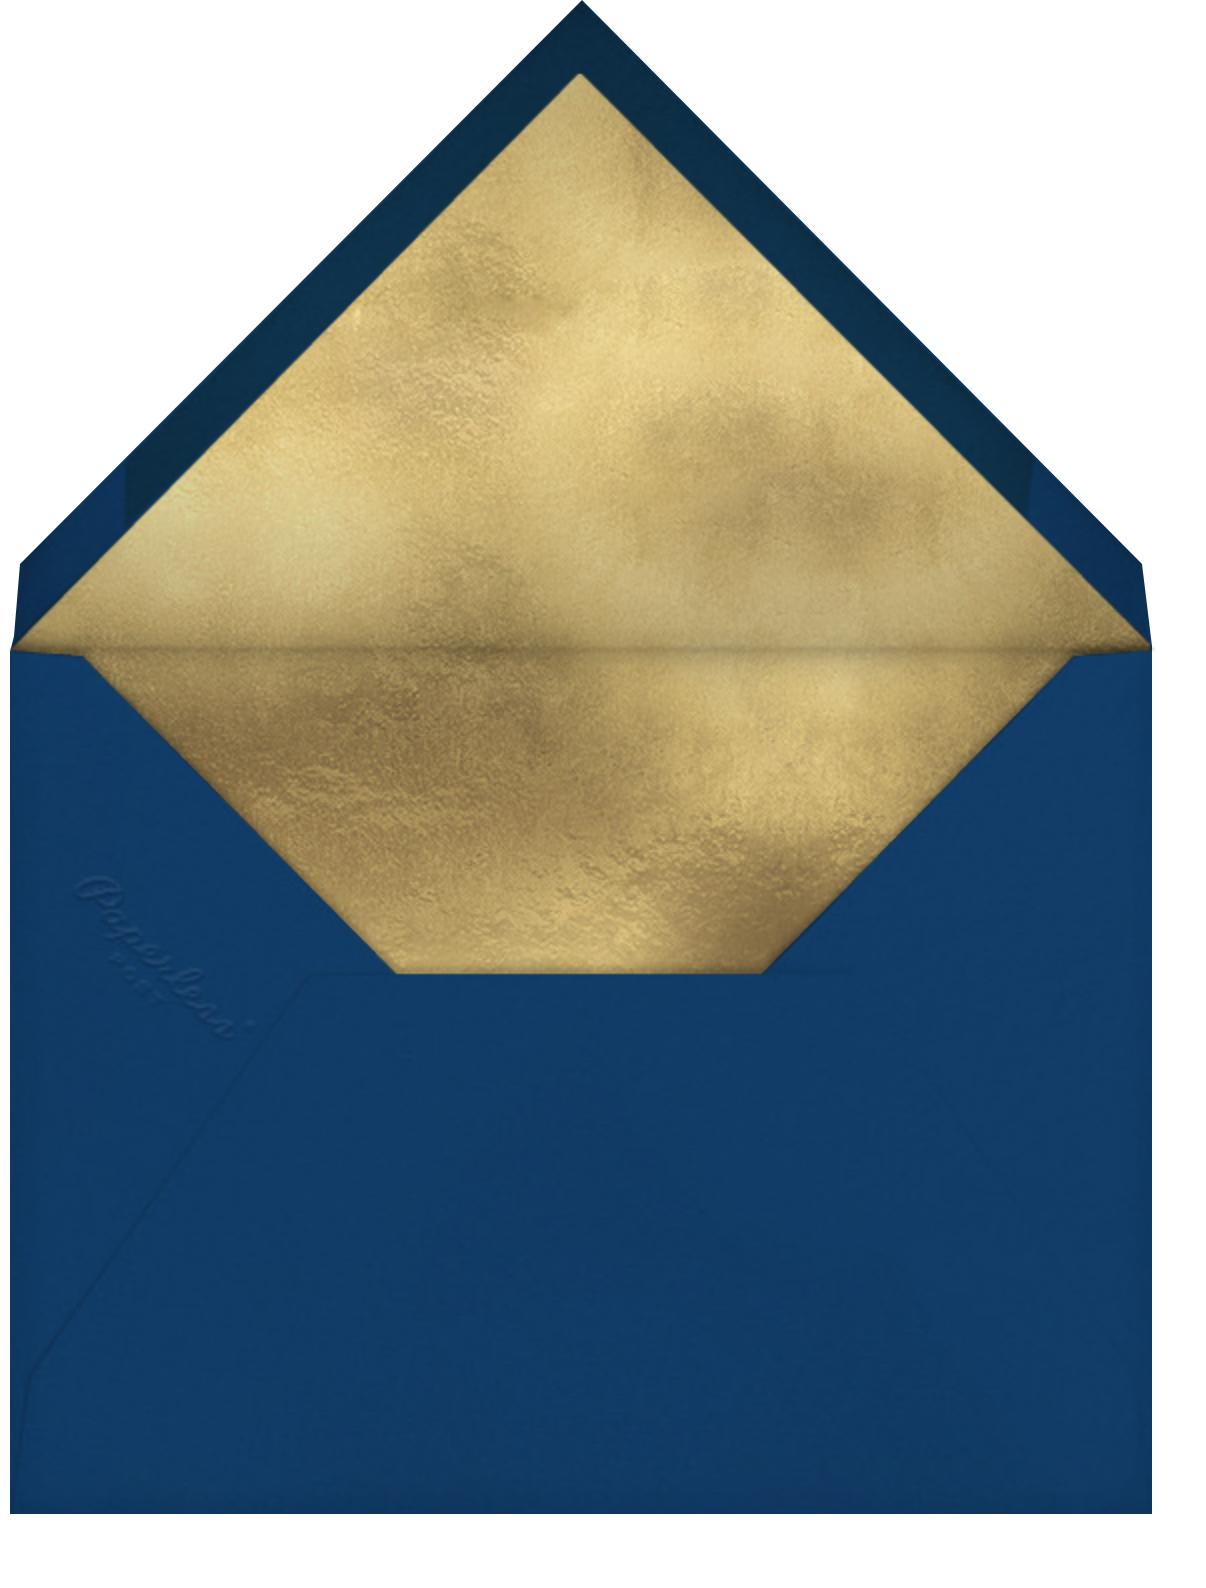 Tuzi (Invitation) - Paperless Post - Envelope